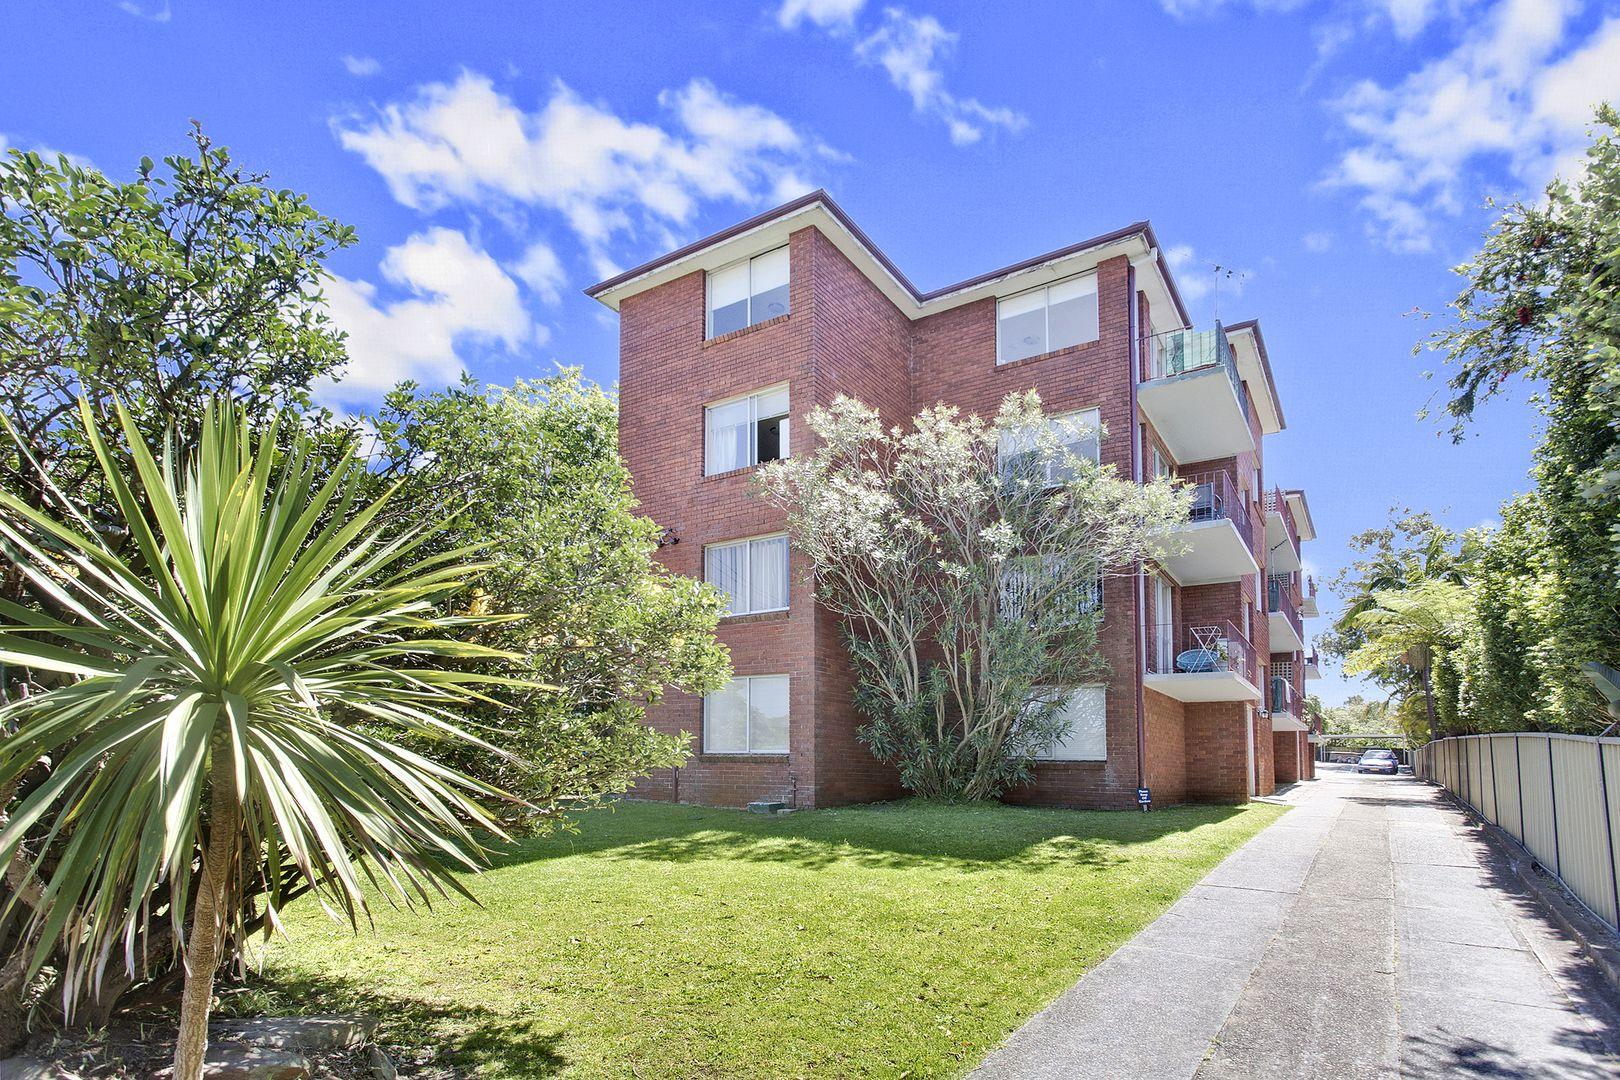 10/34 Serpentine Crescent, North Balgowlah NSW 2093, Image 2